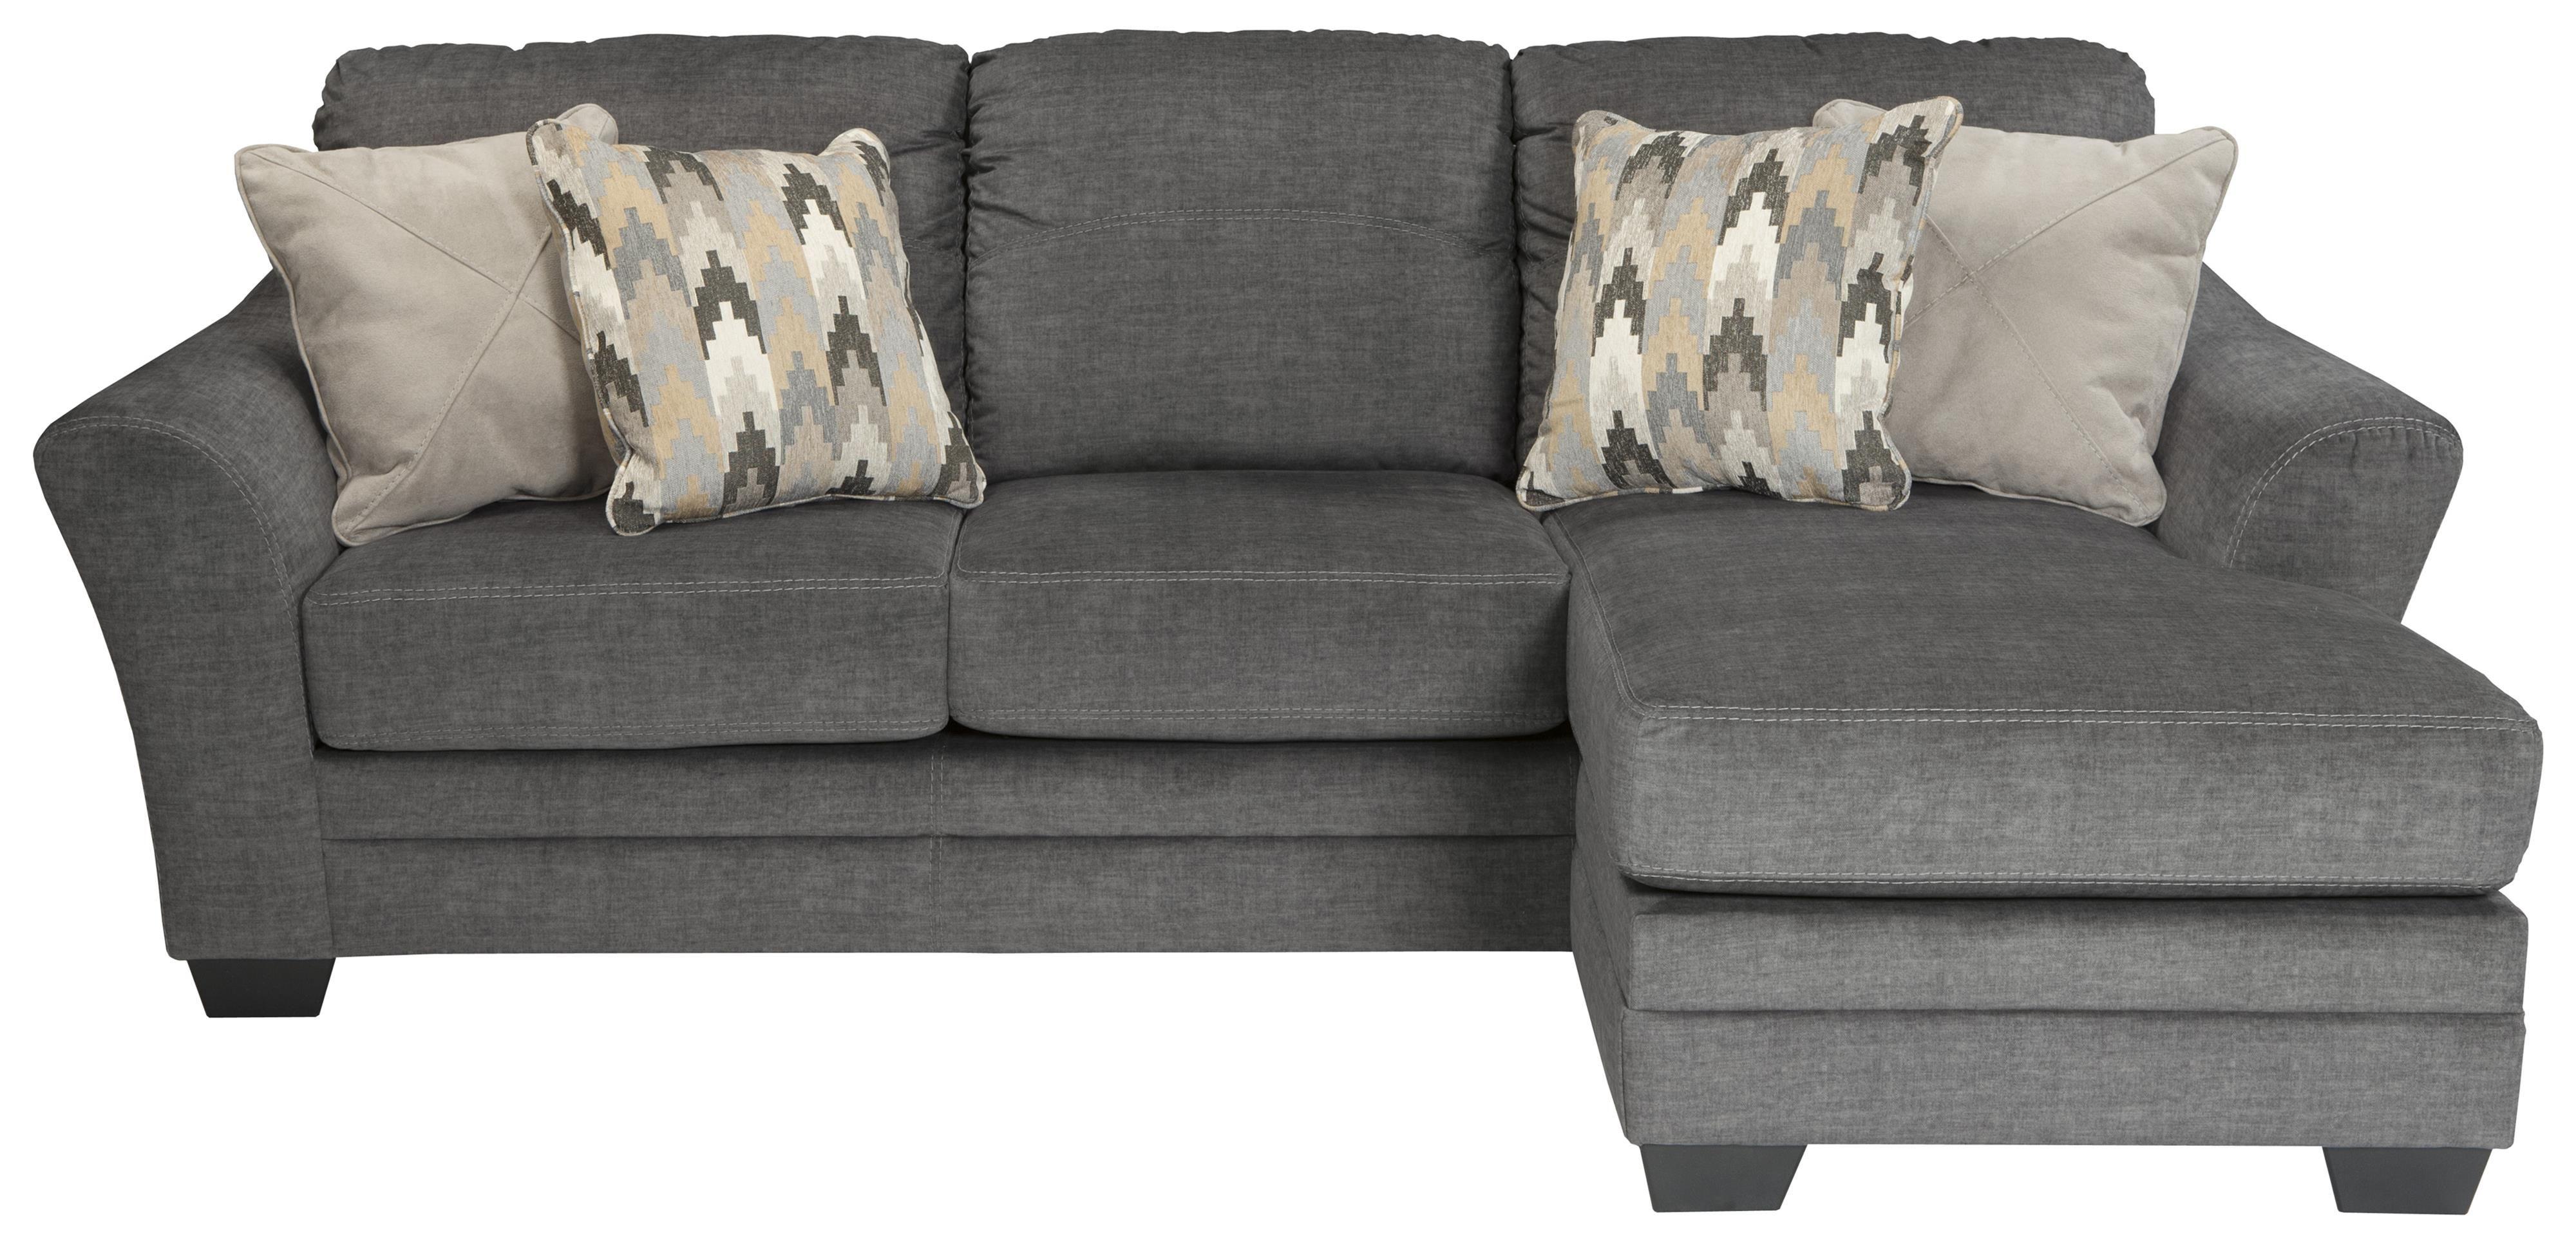 Strange Jb King Brody 8850218 Contemporary Sofa Chaise In Gray Inzonedesignstudio Interior Chair Design Inzonedesignstudiocom